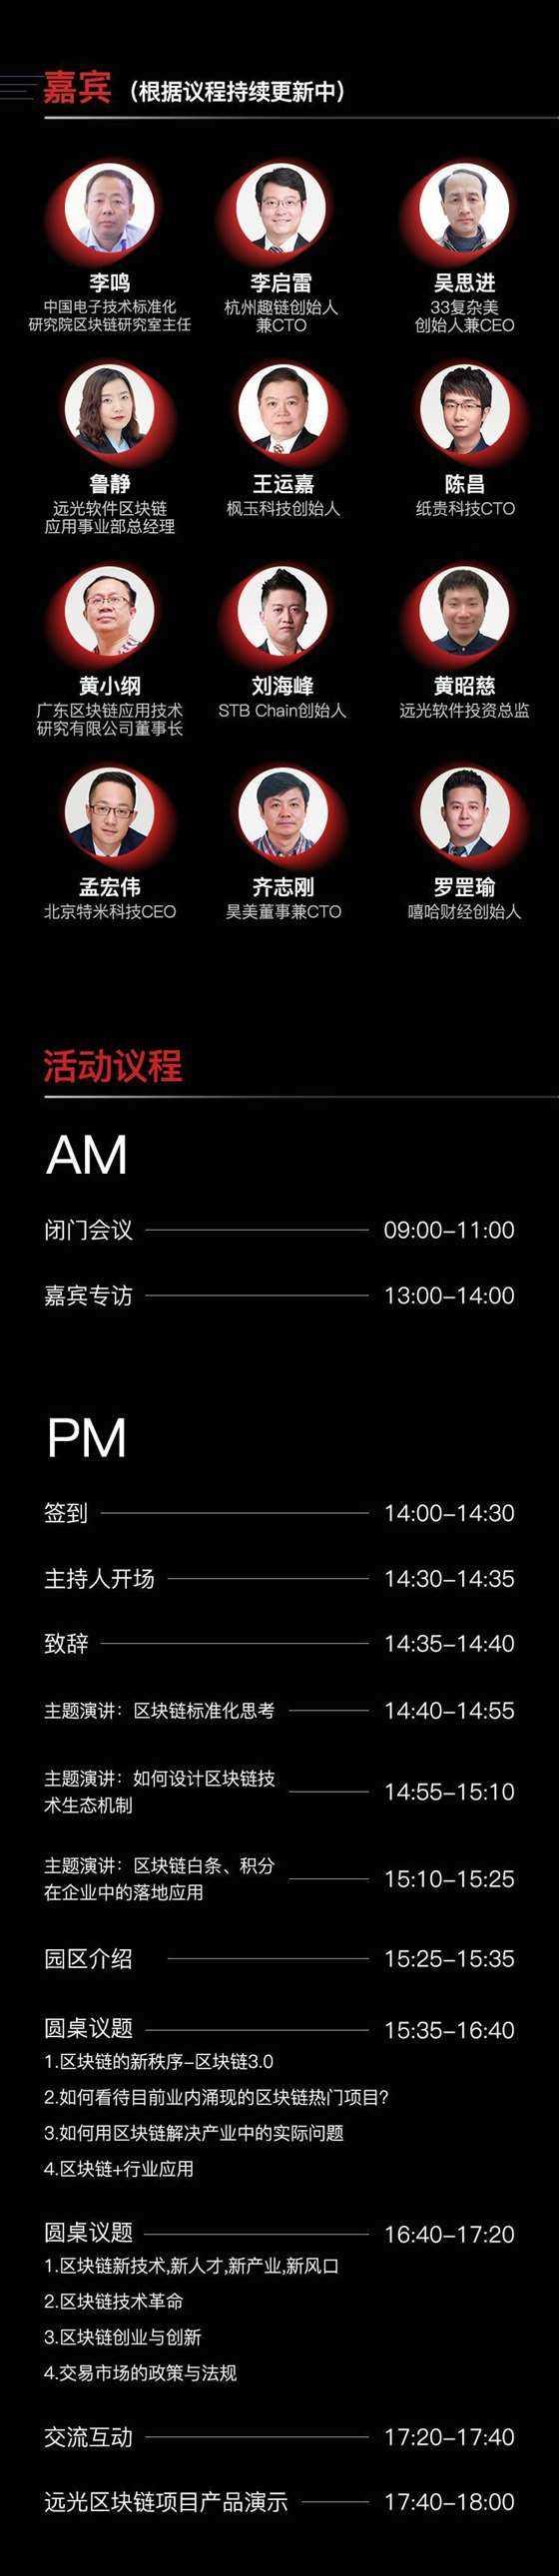 http://www.huodongxing.com/file/20171201/7022891666594/183140600761418.jpg